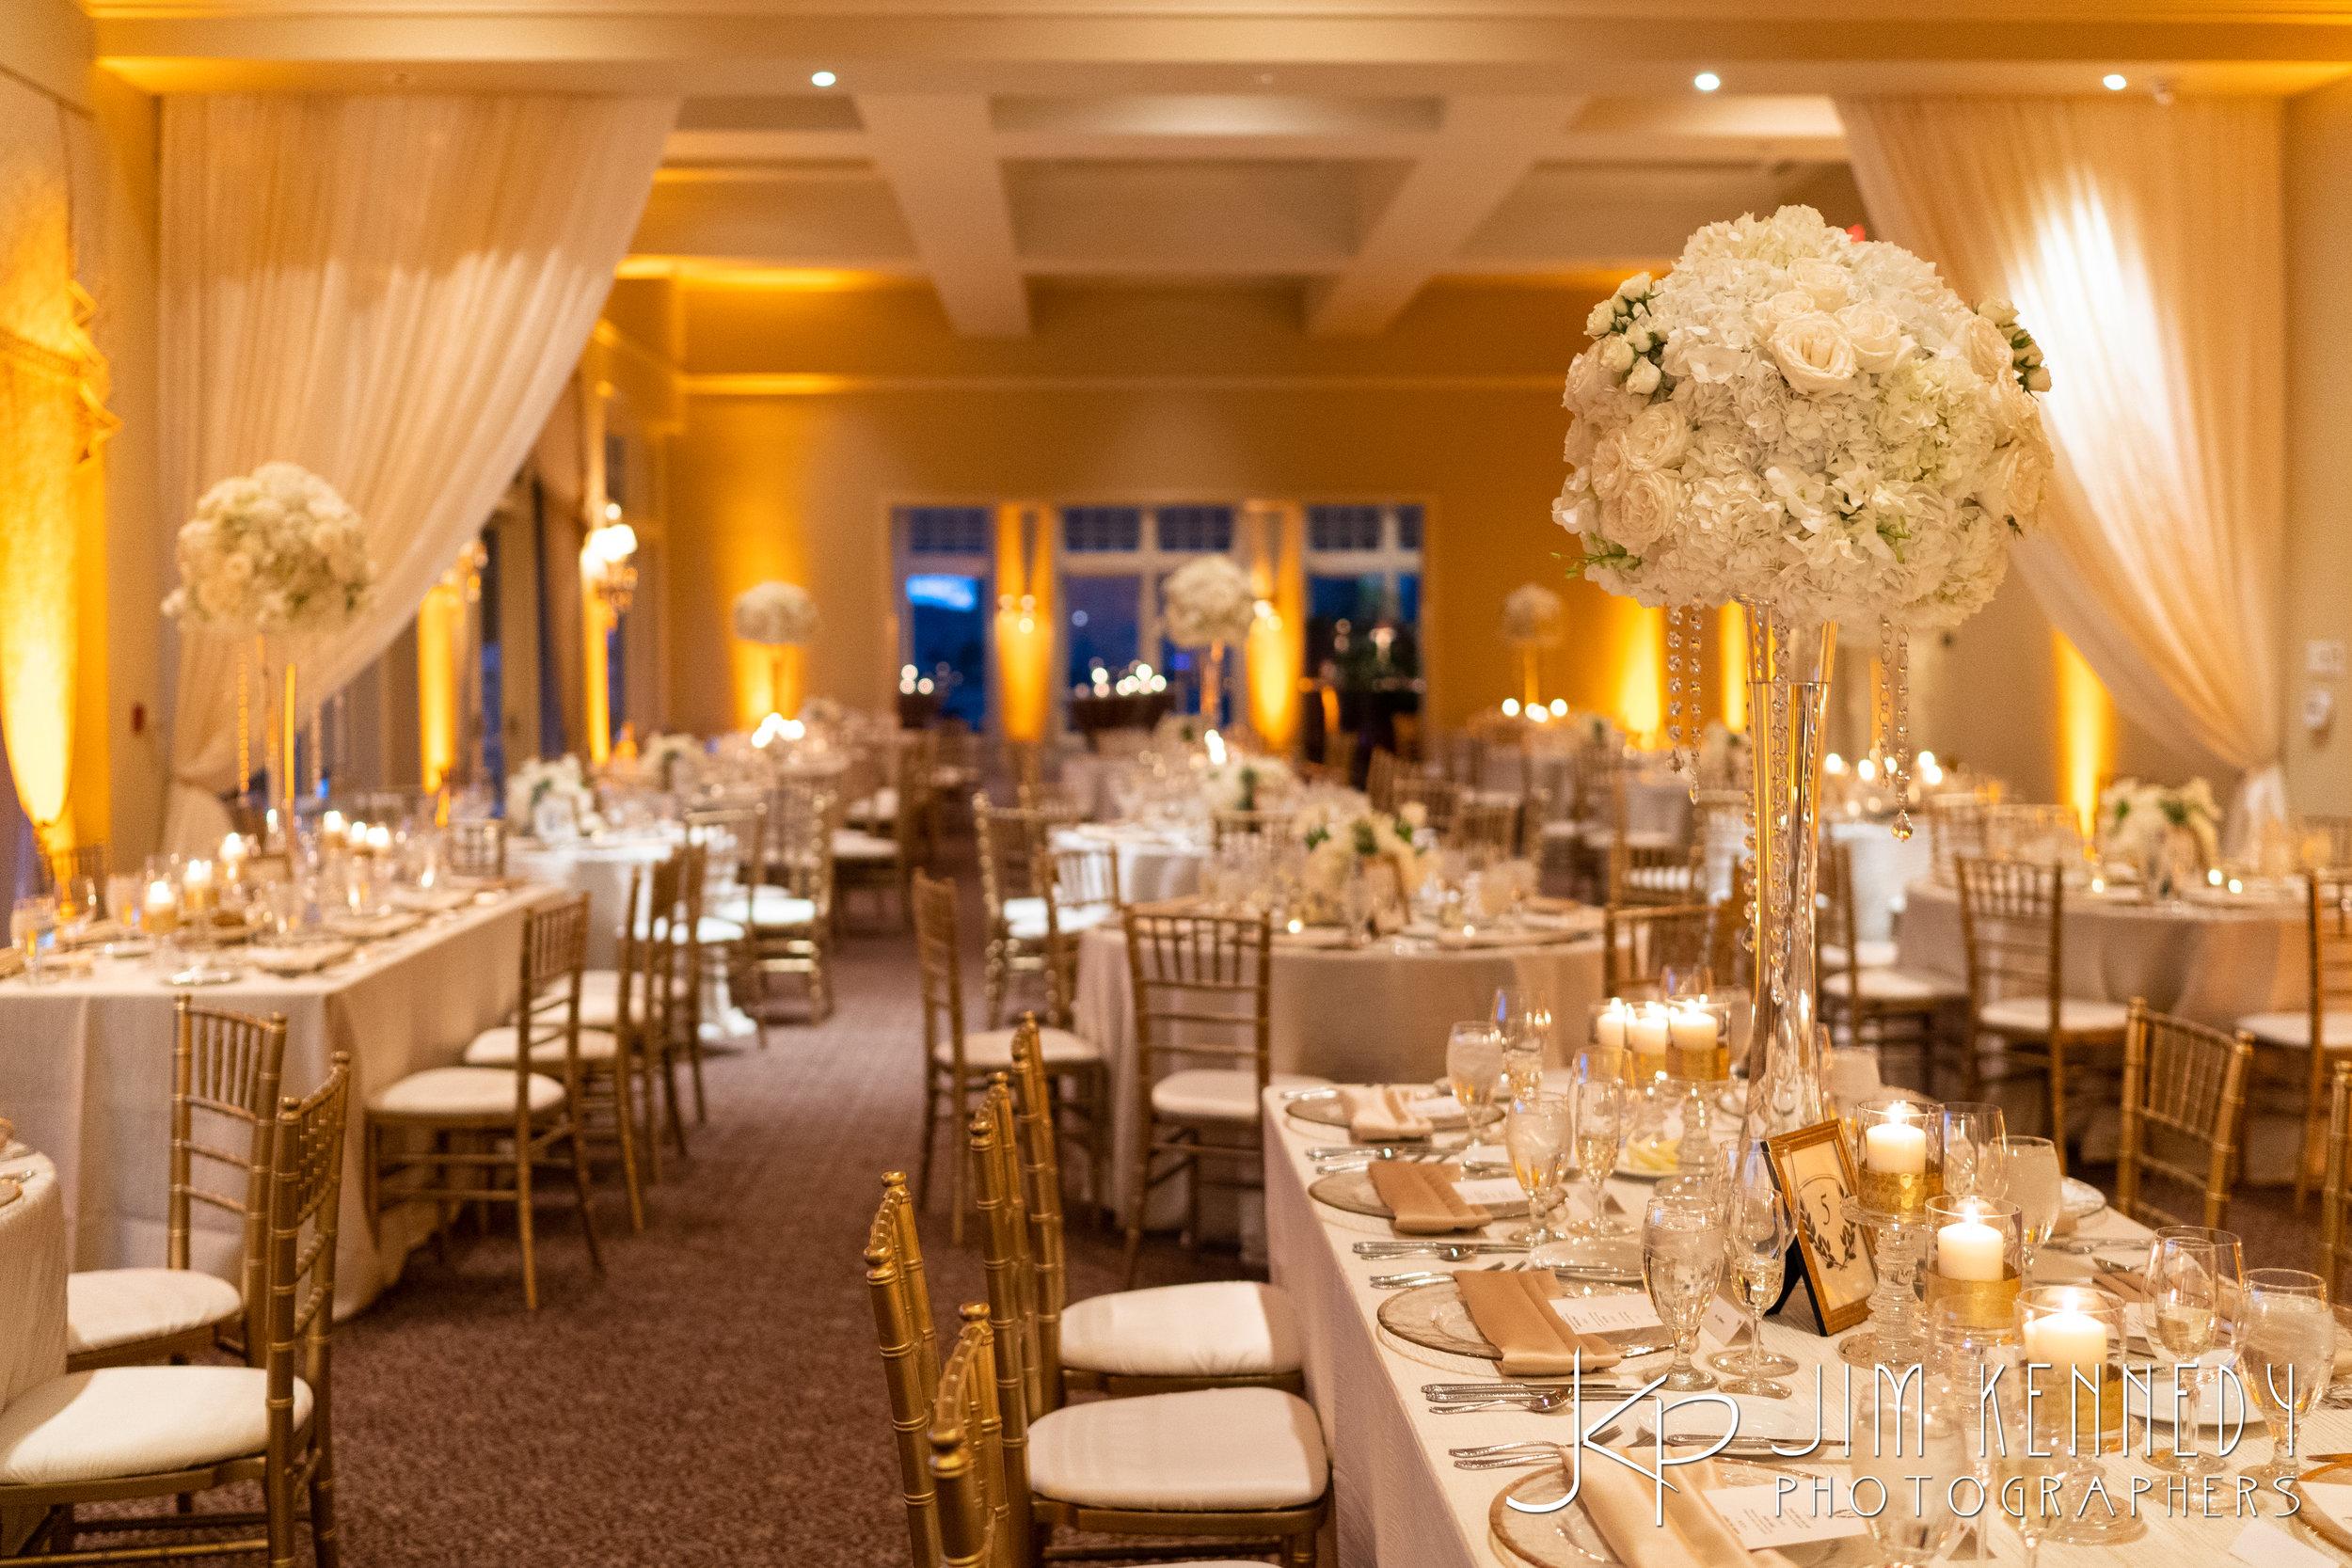 sherwood_country_club_wedding-2902.jpg